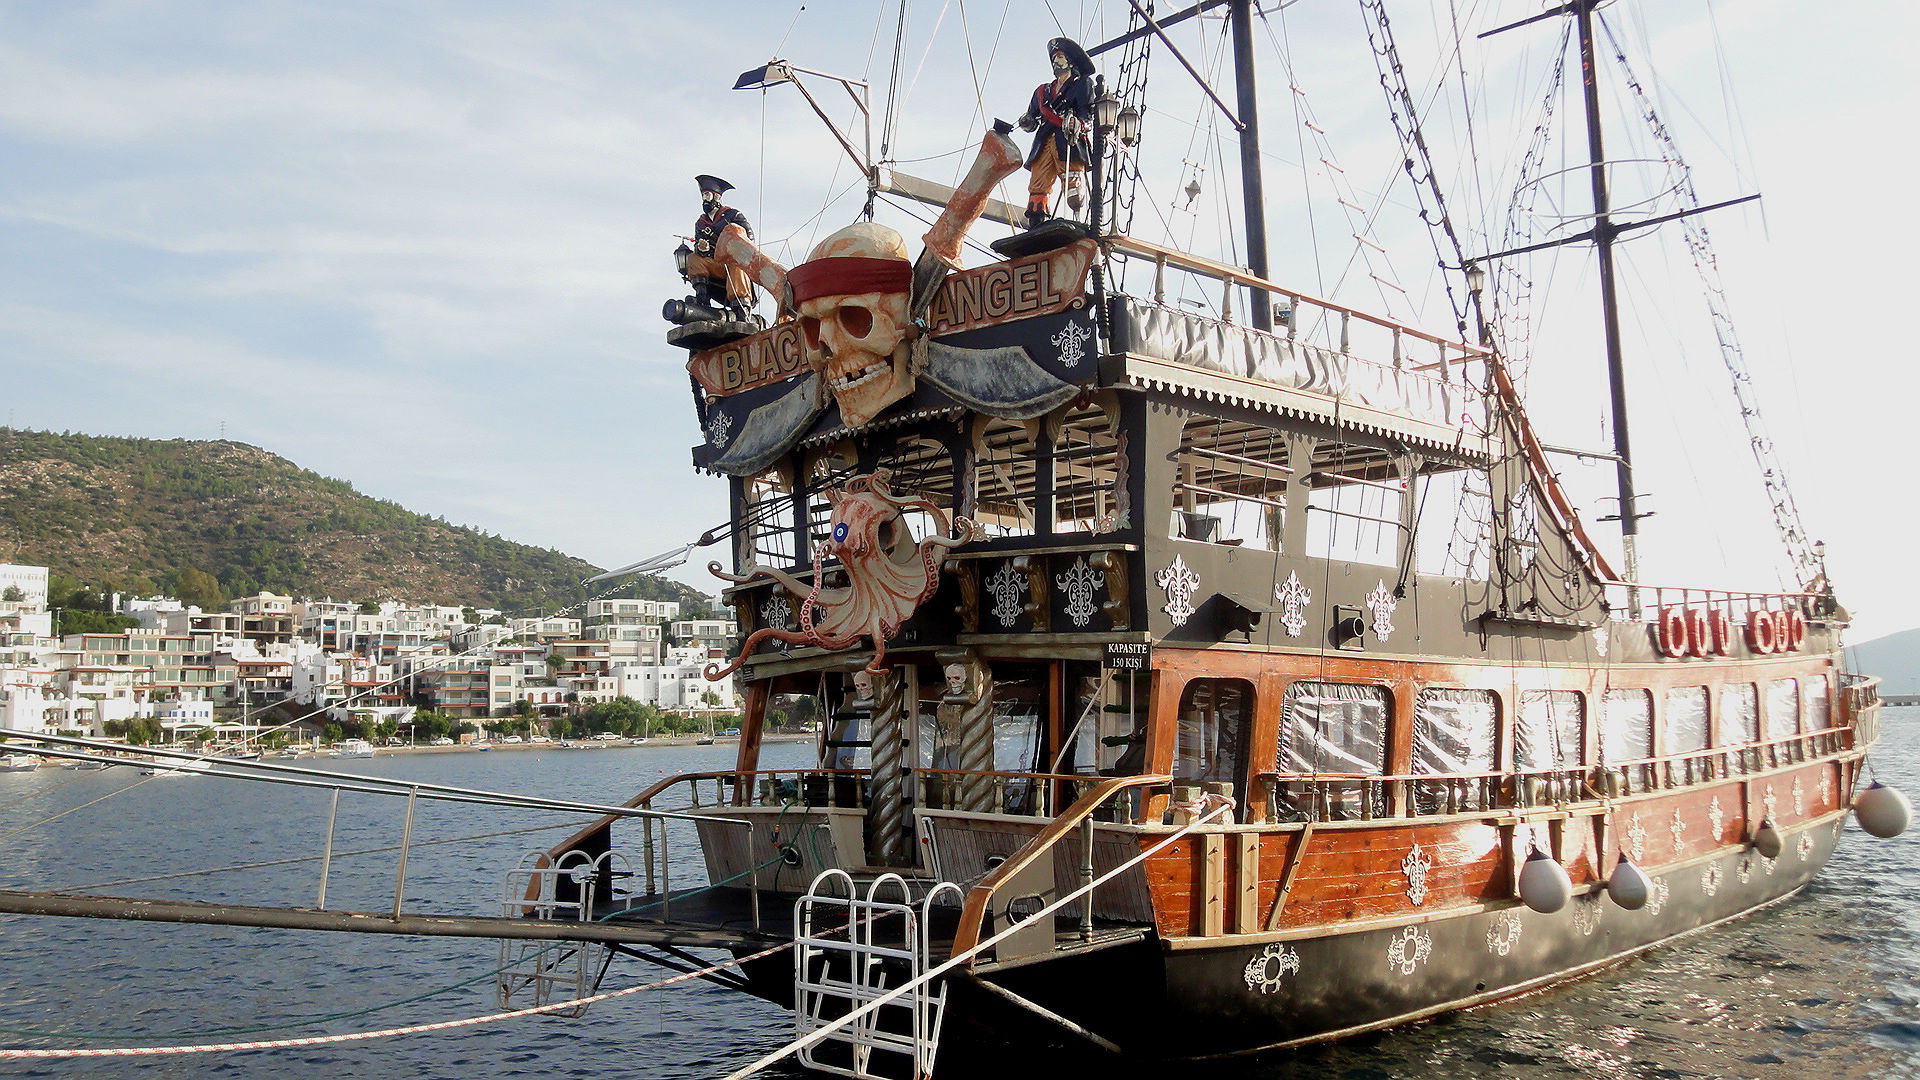 pirates of the caribean.jpg